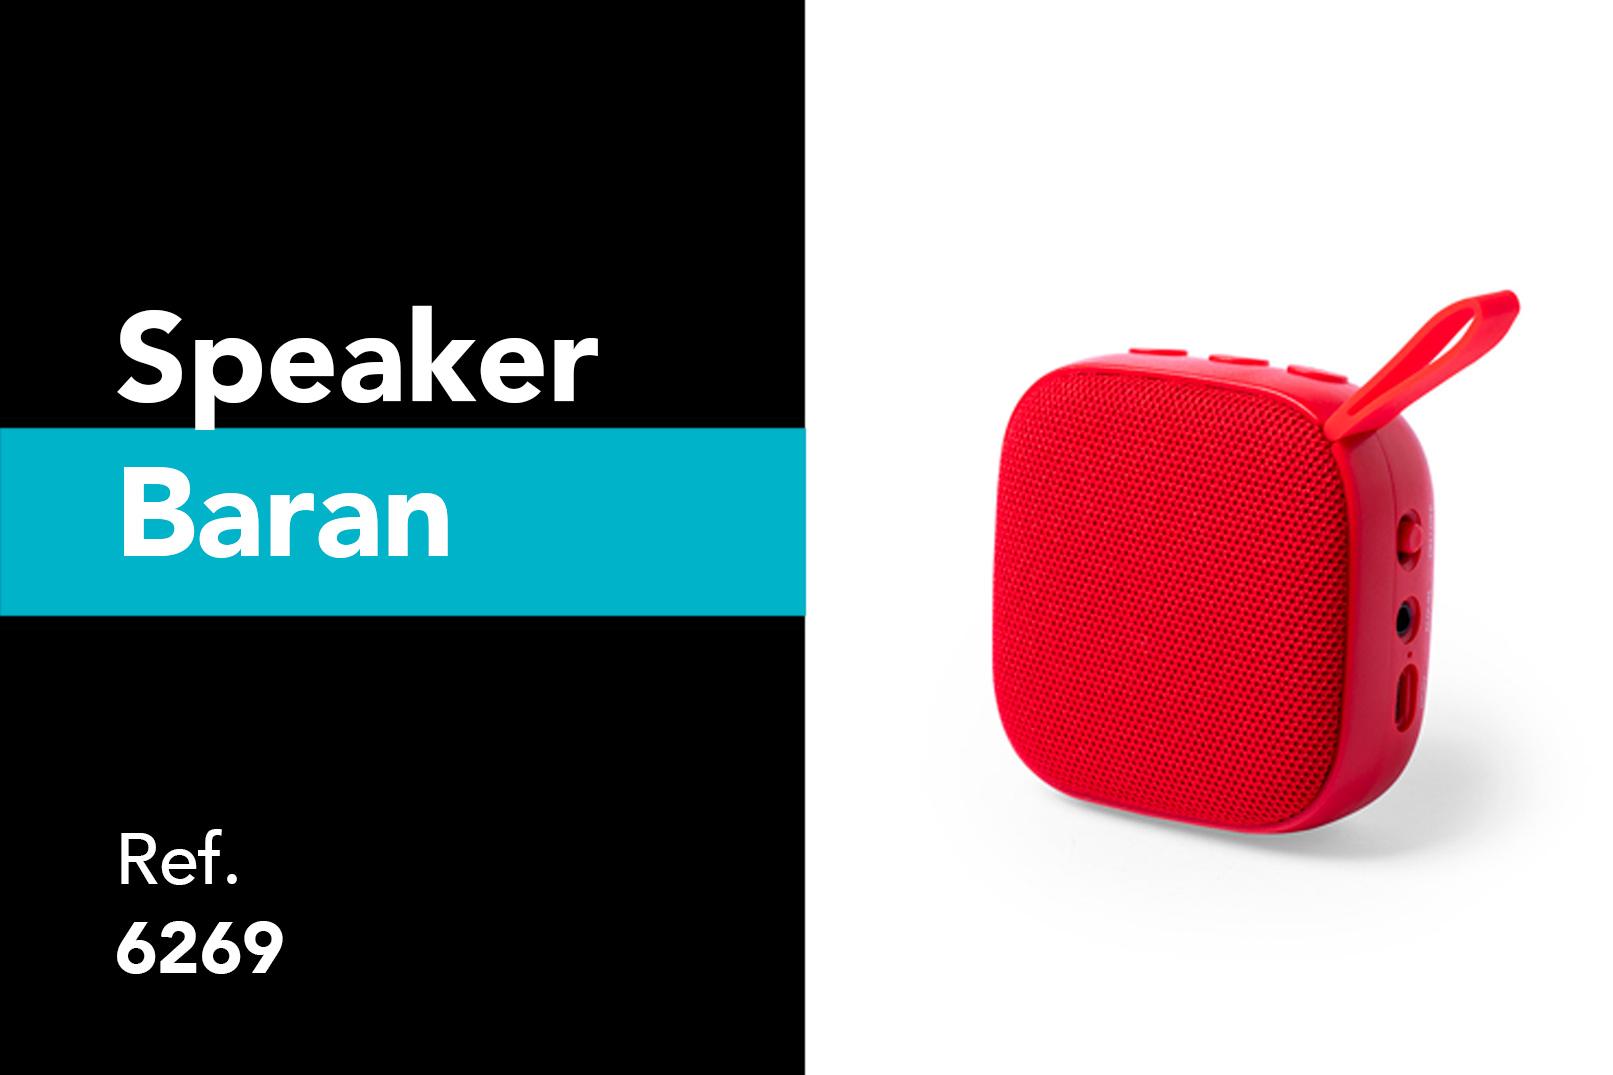 6269-speaker-Baran-1613x1075